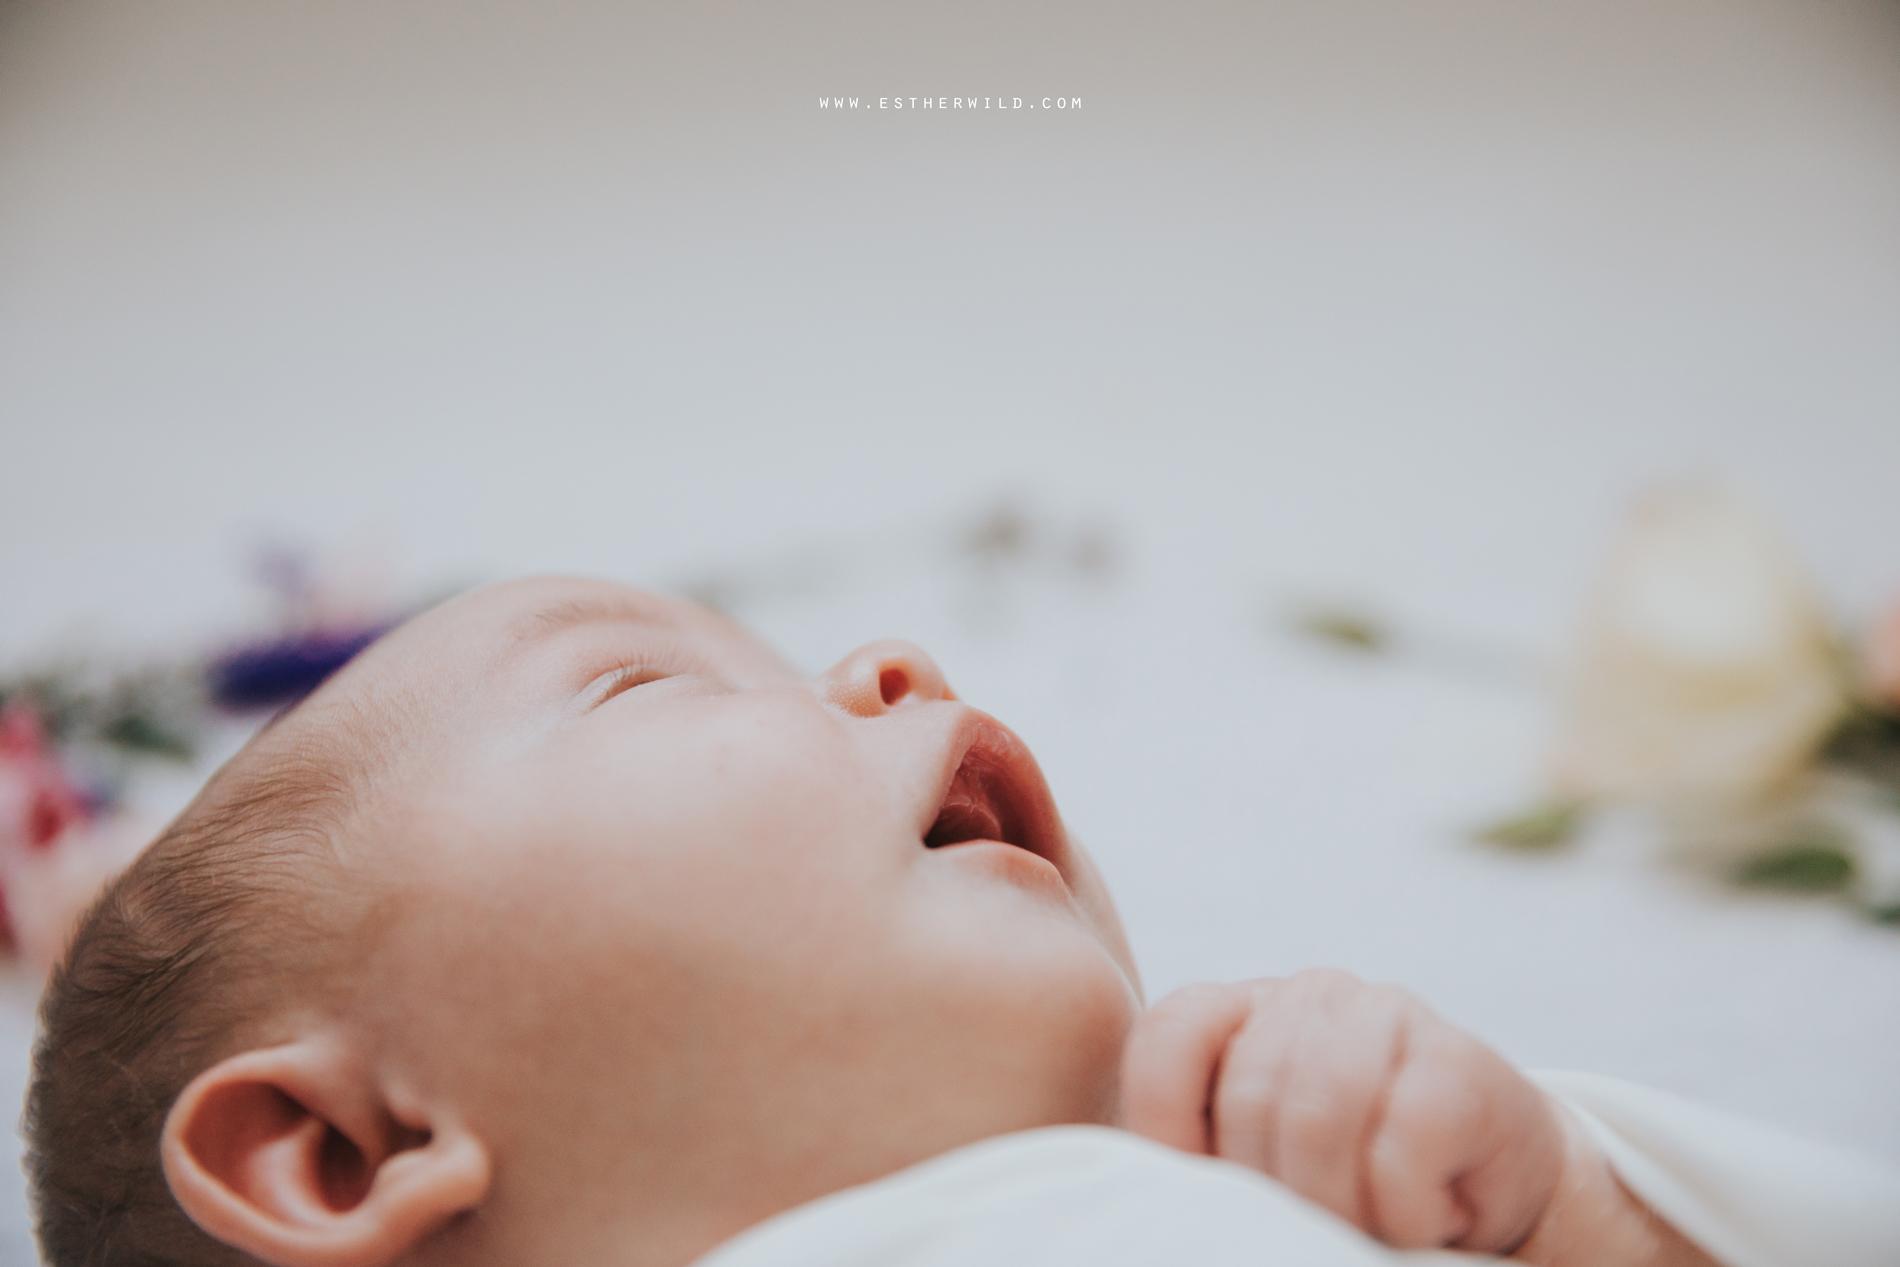 Newborn_Family_Photographer_Home_Norfolk_3R8A3824.jpg